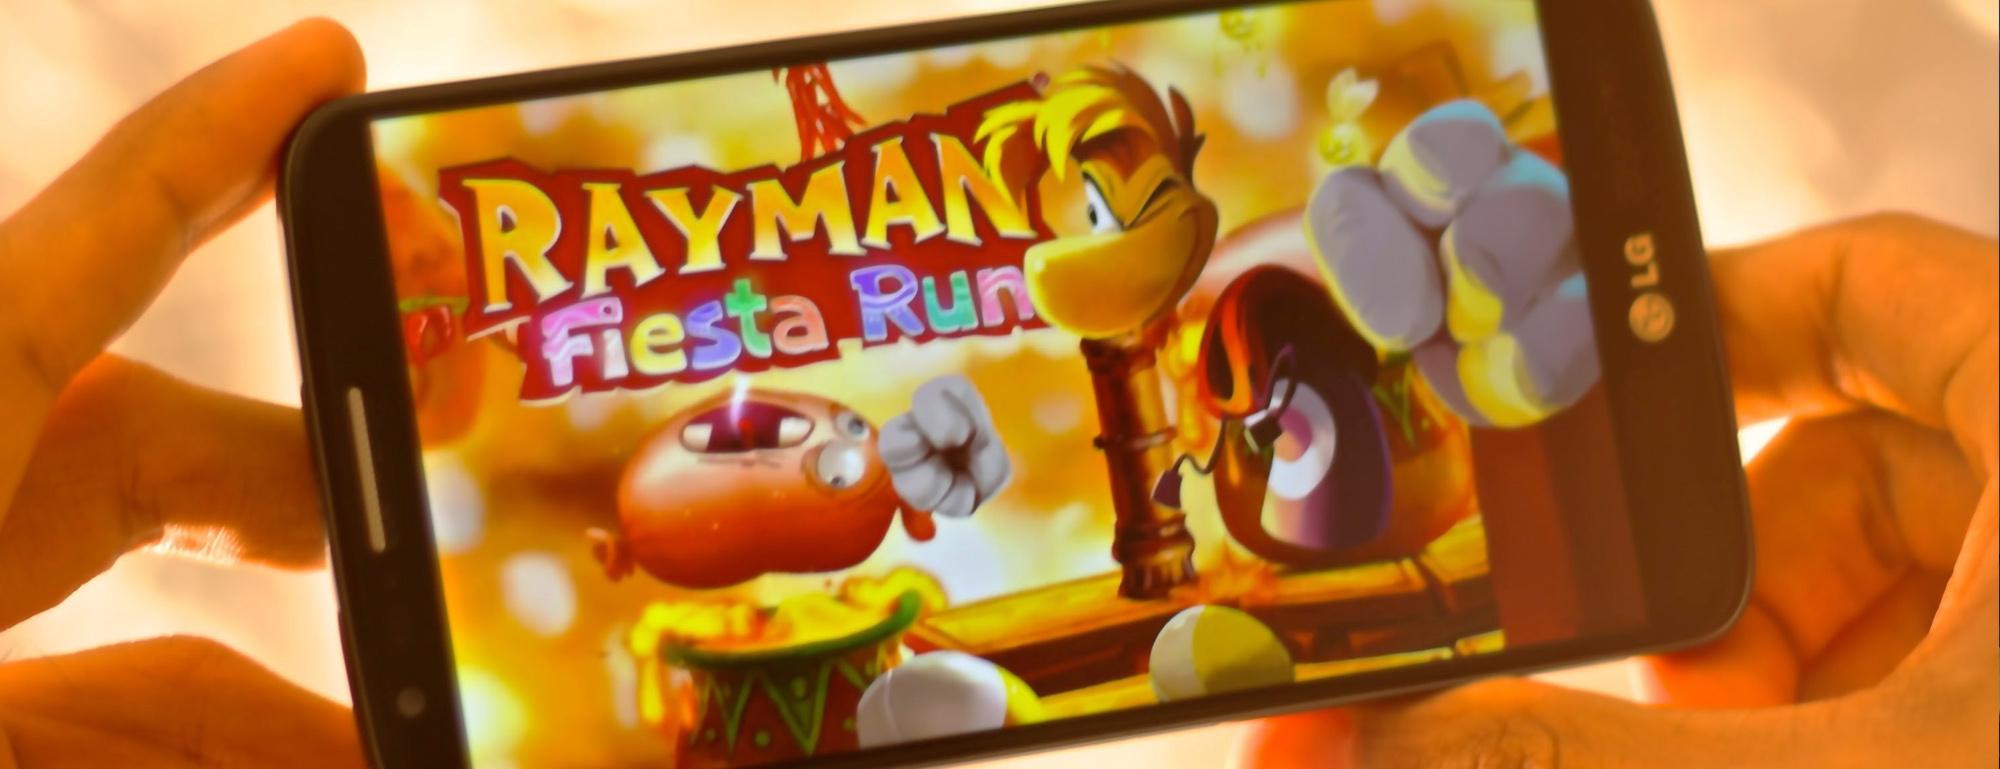 Rayman Run series